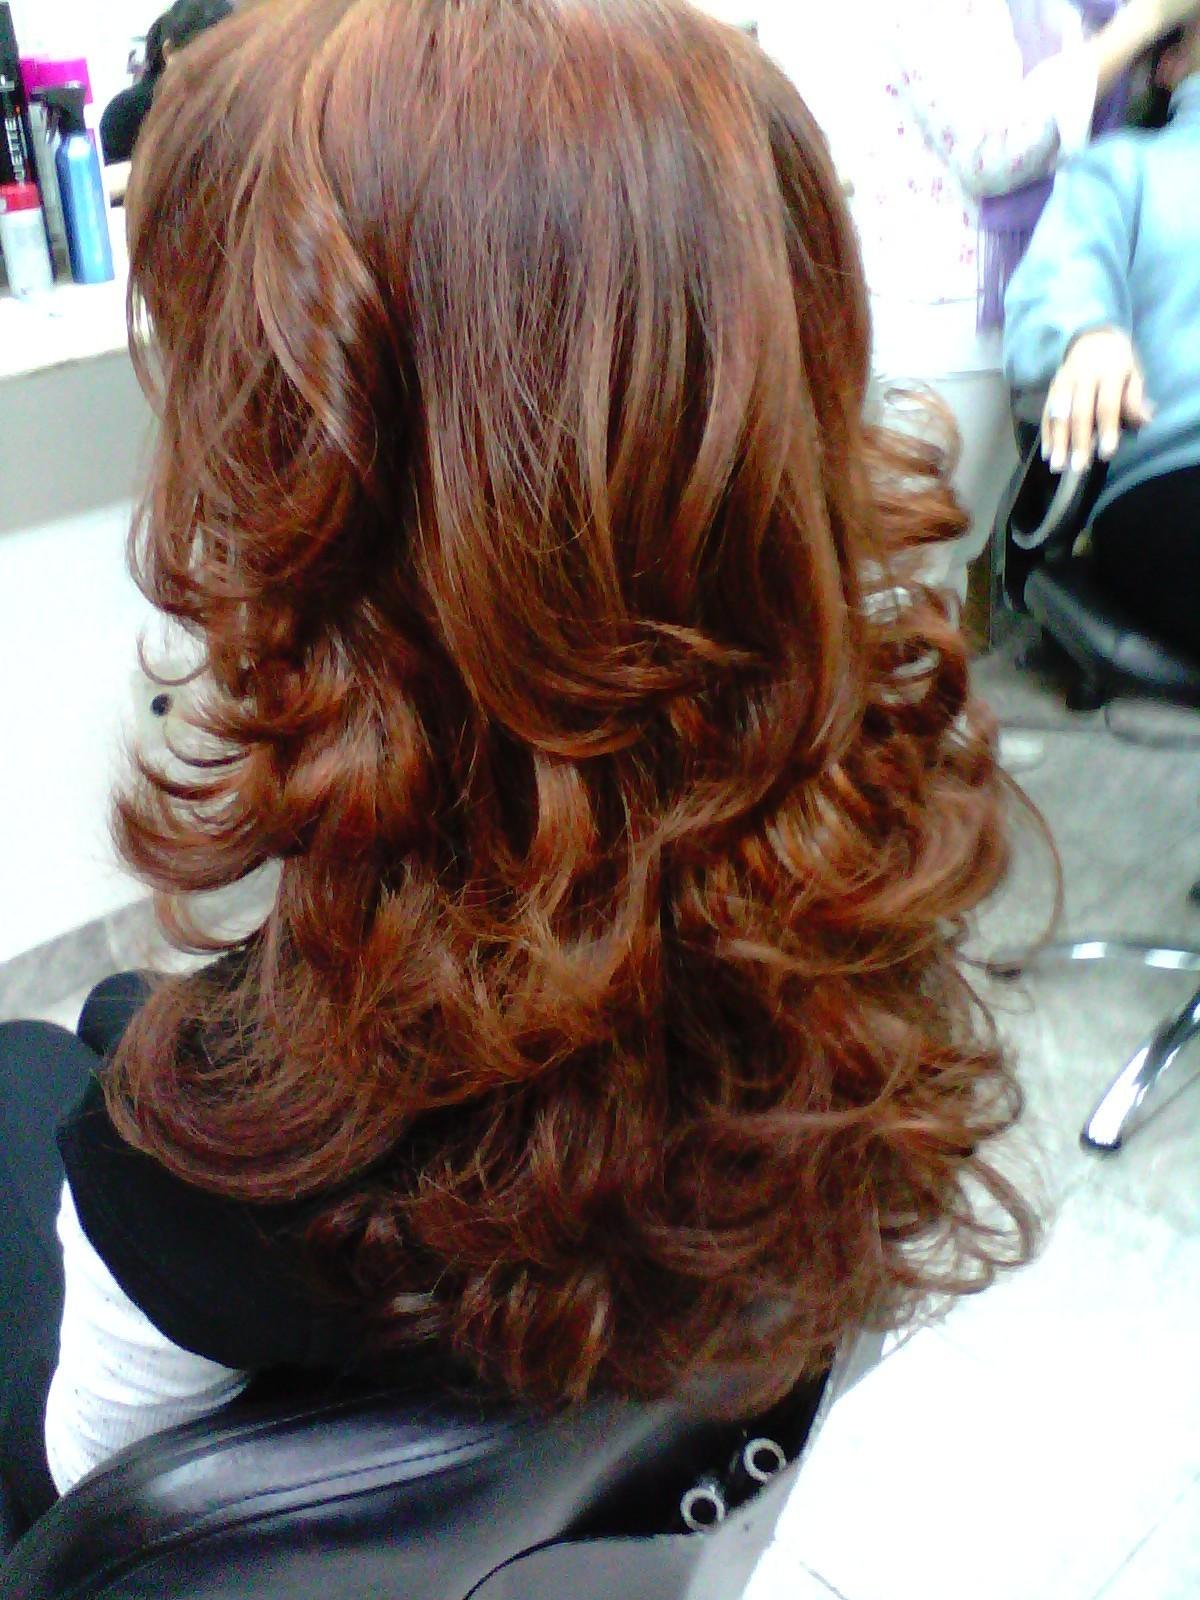 ruivo, escova, ondulado cabelo  cabeleireiro(a) maquiador(a)